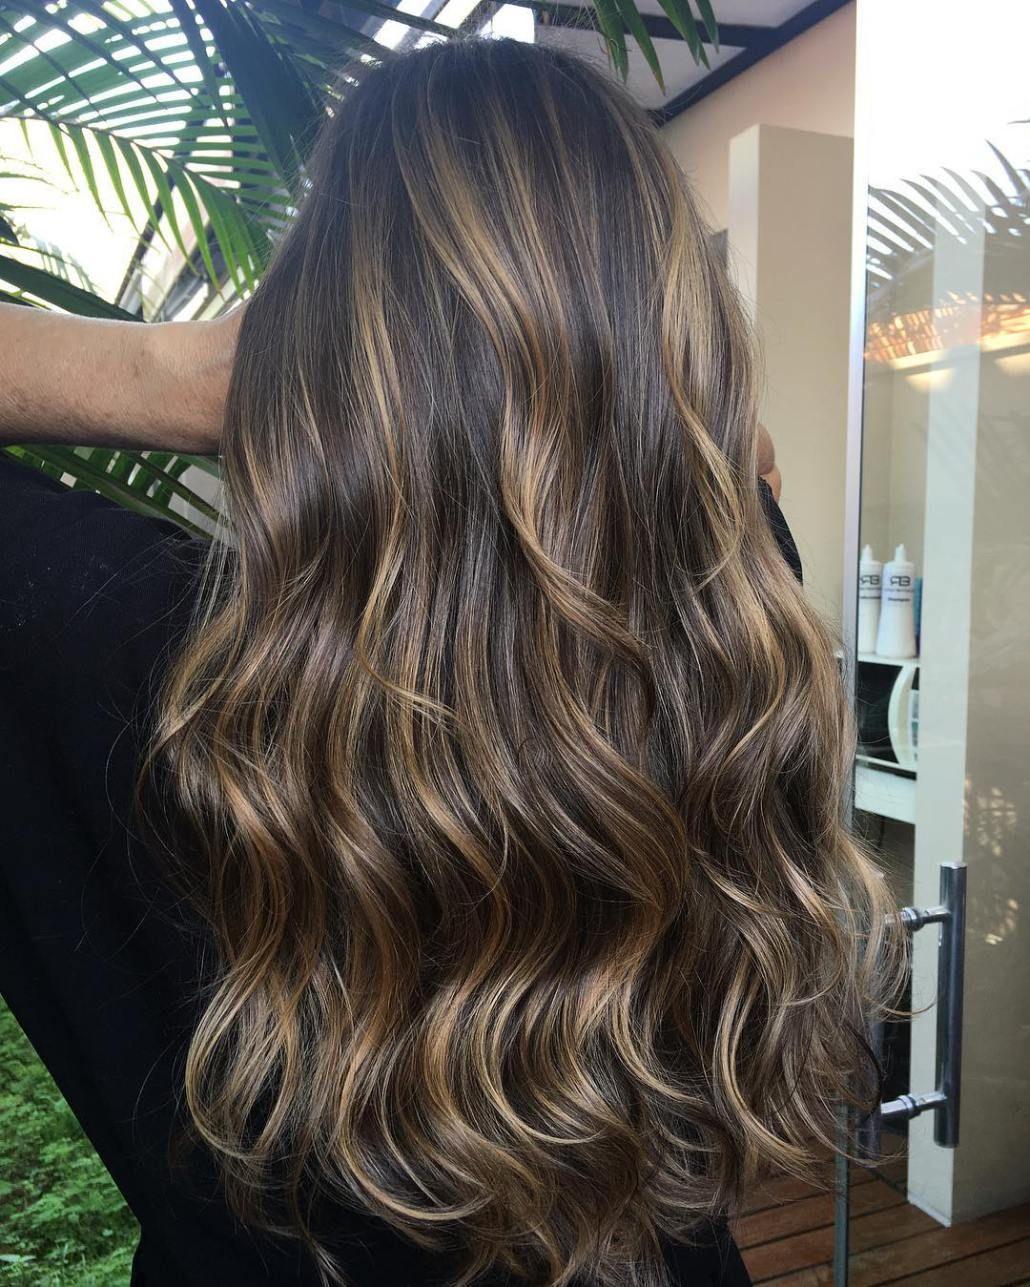 Dark Golden Blonde Highlights Balayage Balayage Brunette Brunette Balayage Hair Balayage Hair